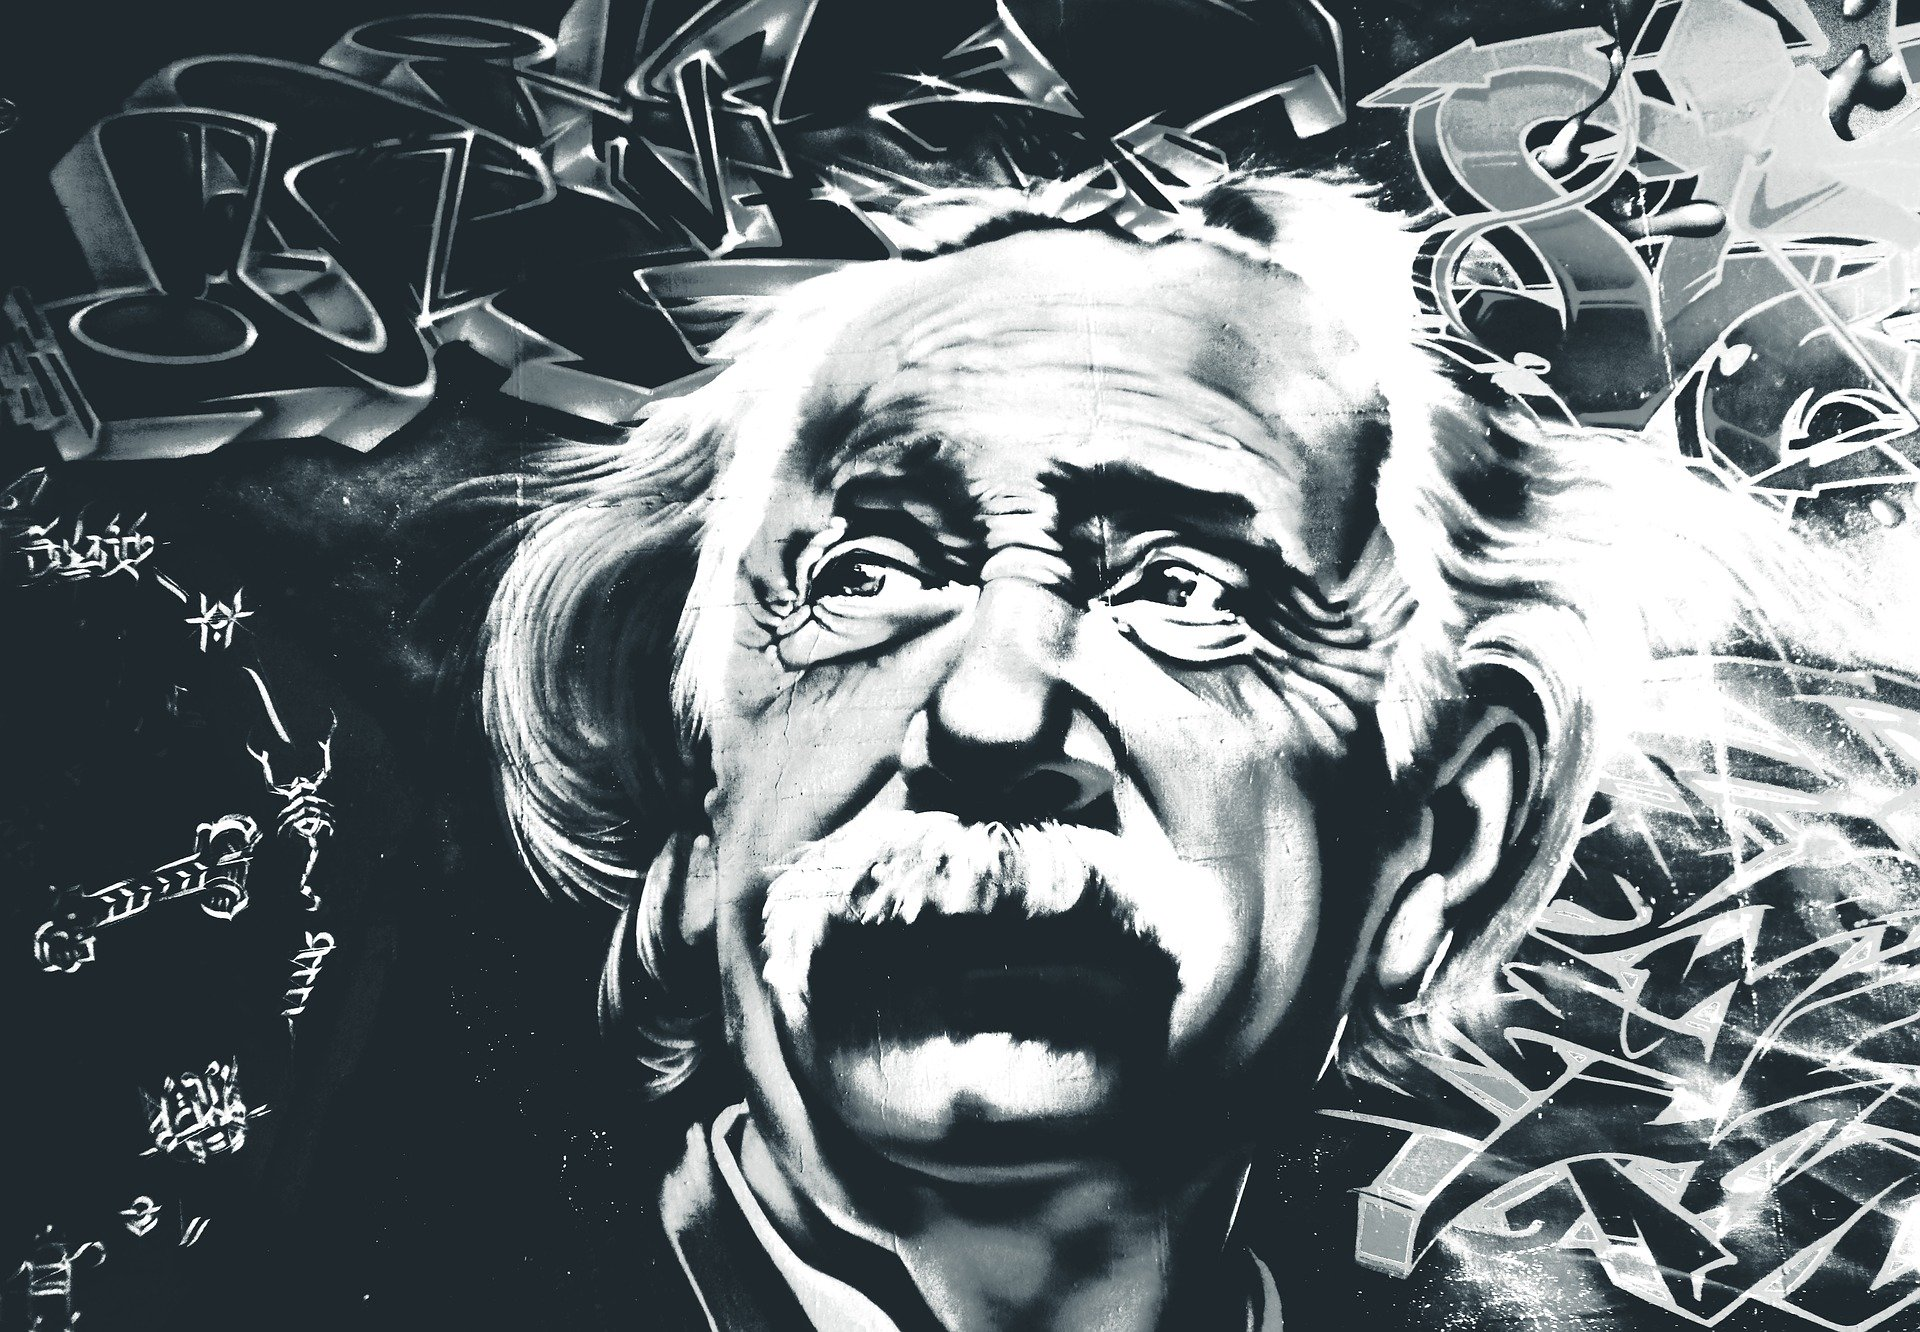 Graffiti drawing of Albert Einstein